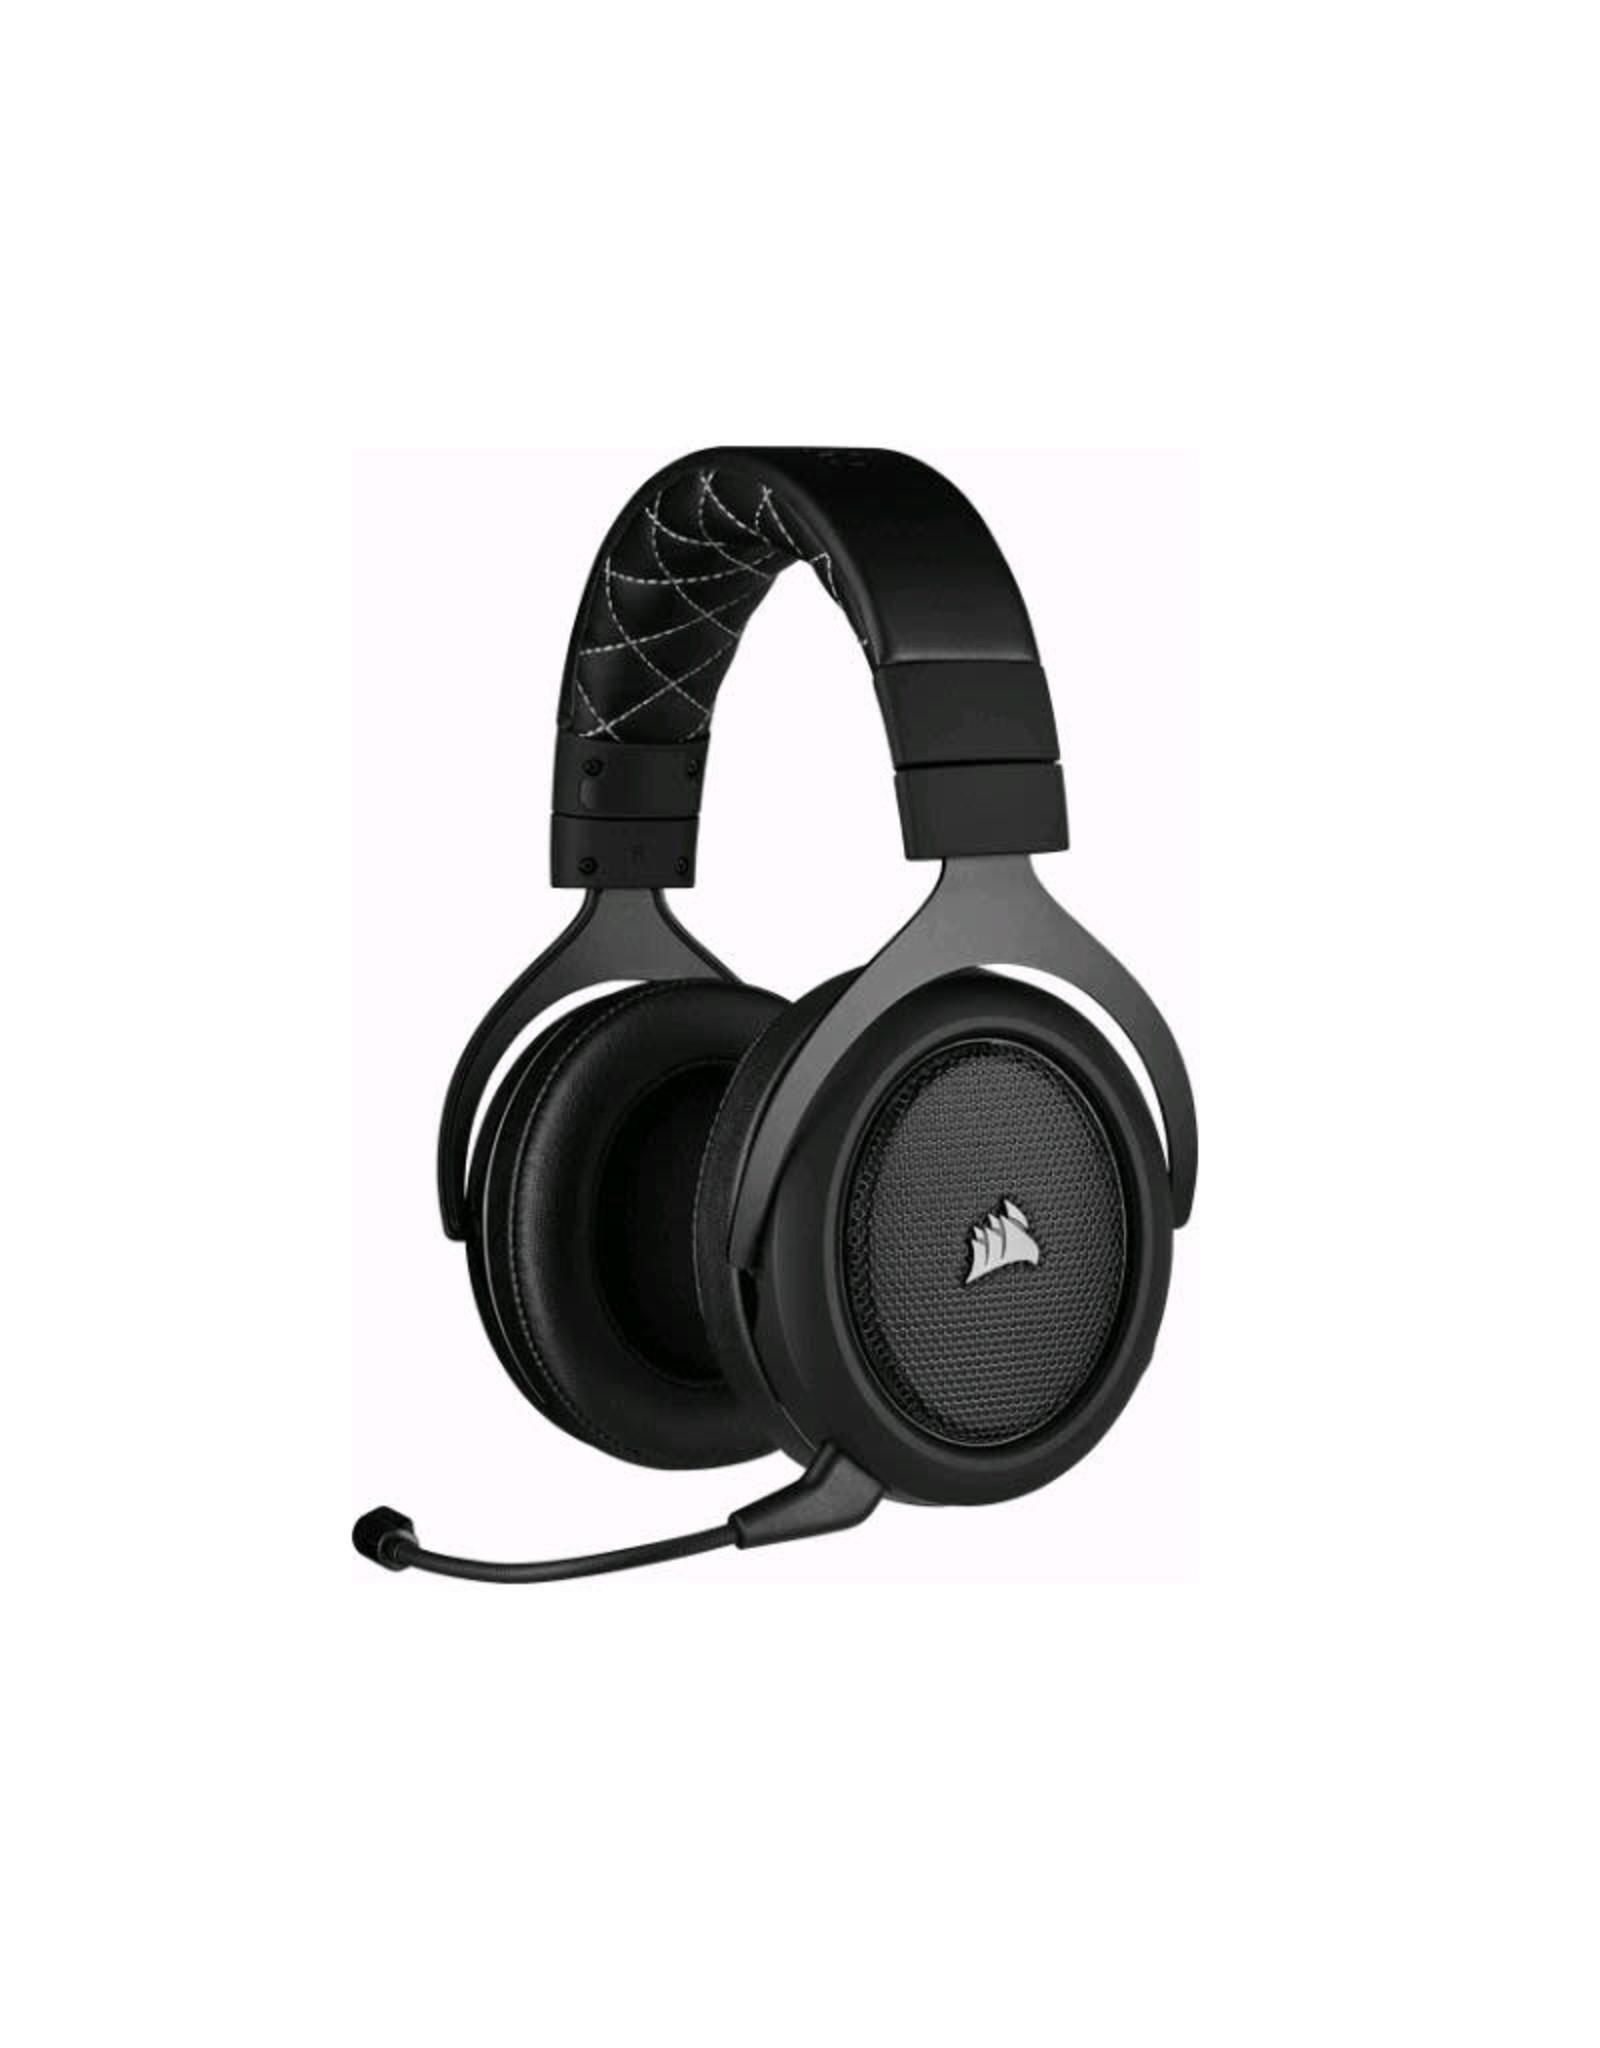 Corsair Corsair HS70 Pro Wireless Gaming Headset SKU-6428248